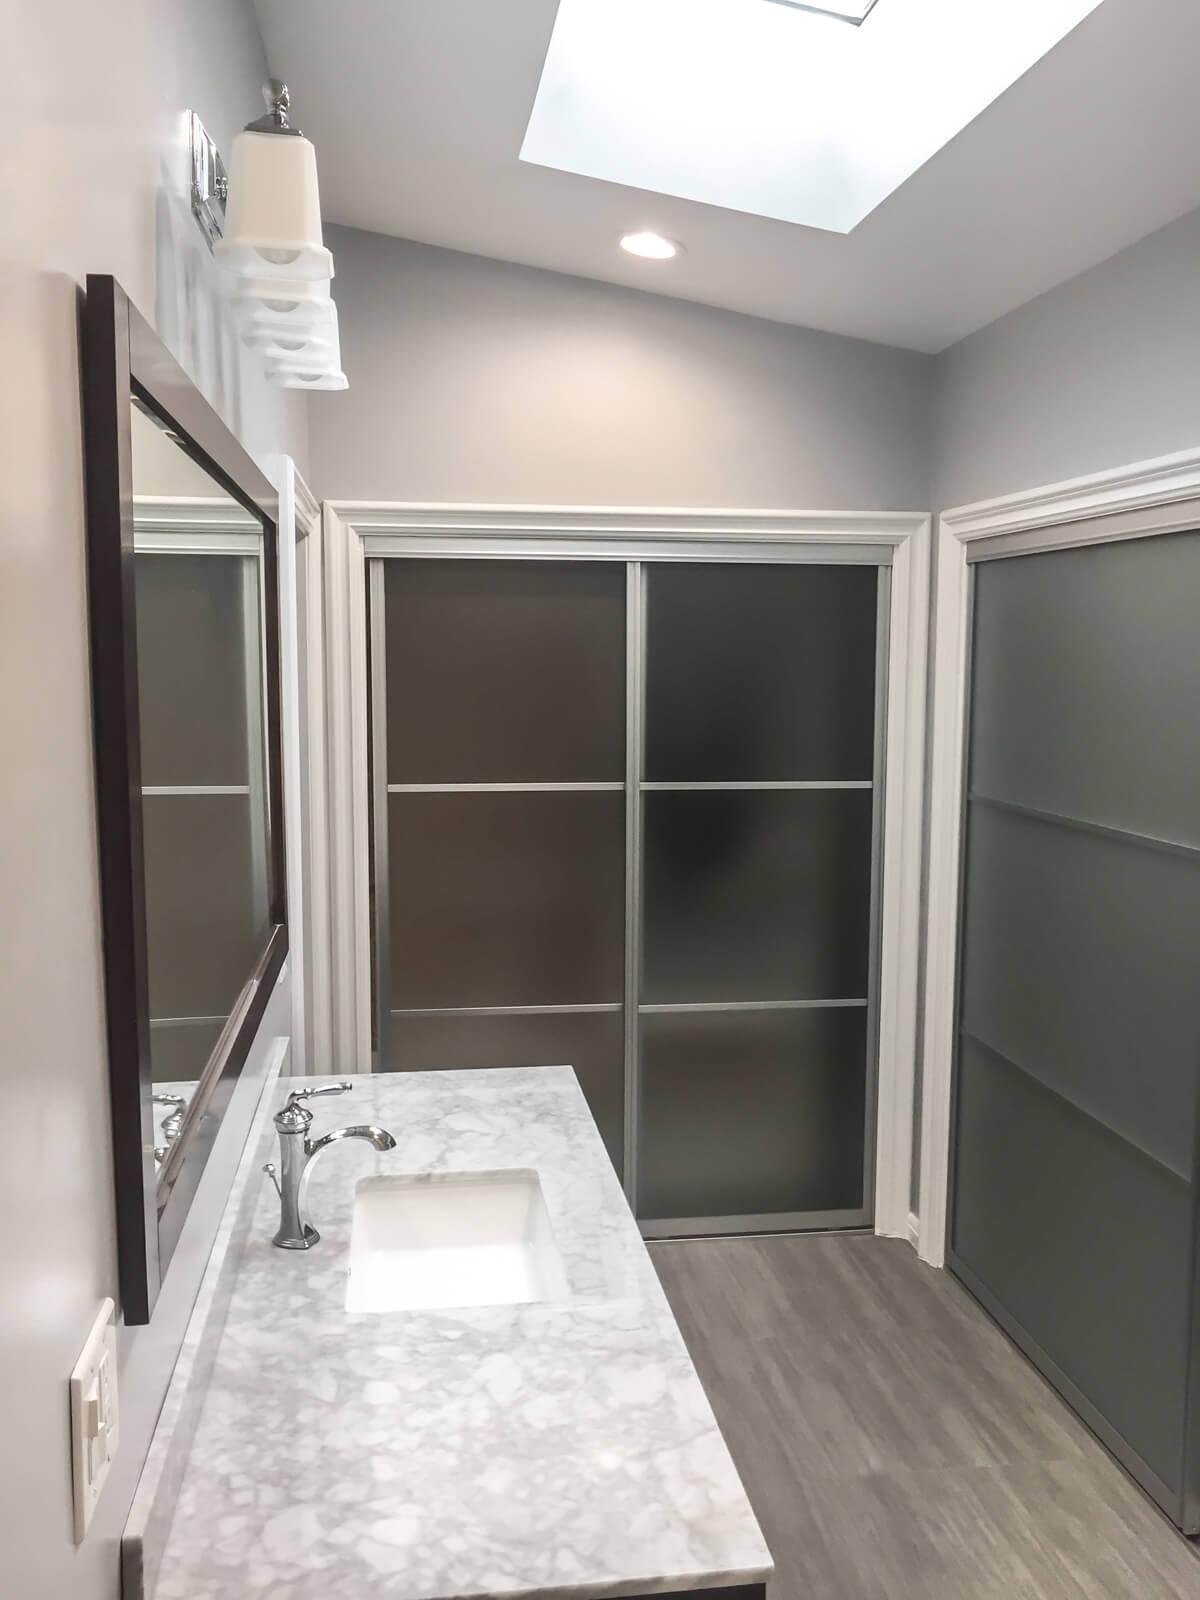 18 - Laraine Project - Los Angeles - Bathroom Remodel Reconfiguration